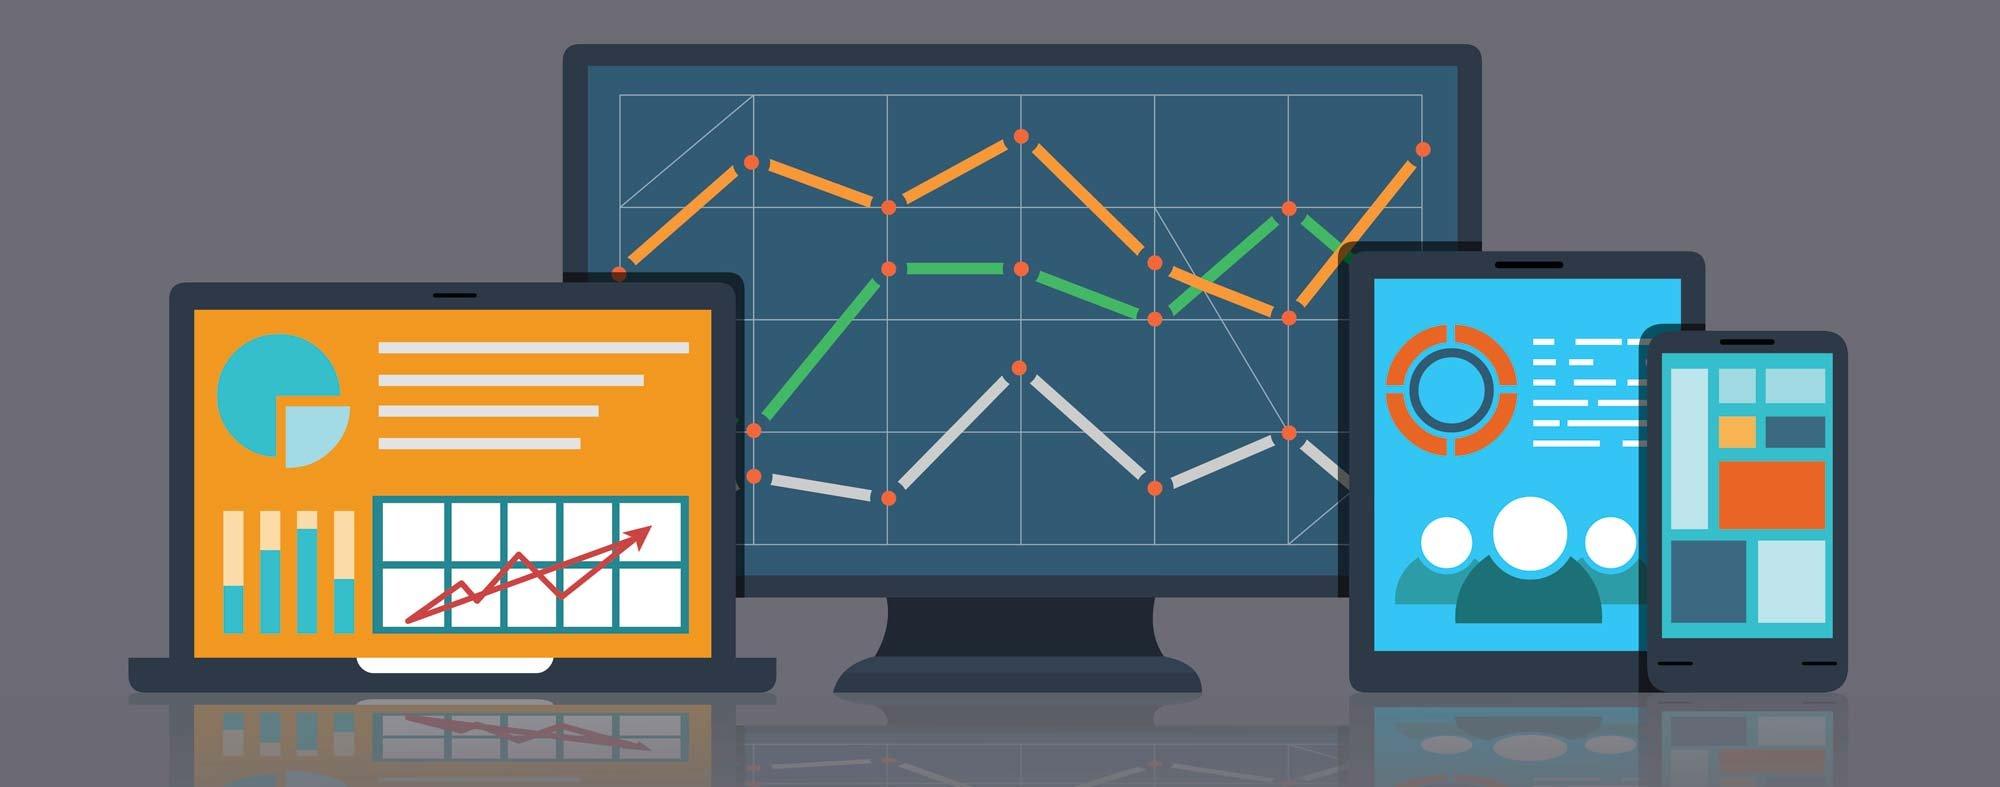 seo adwords data visualizations